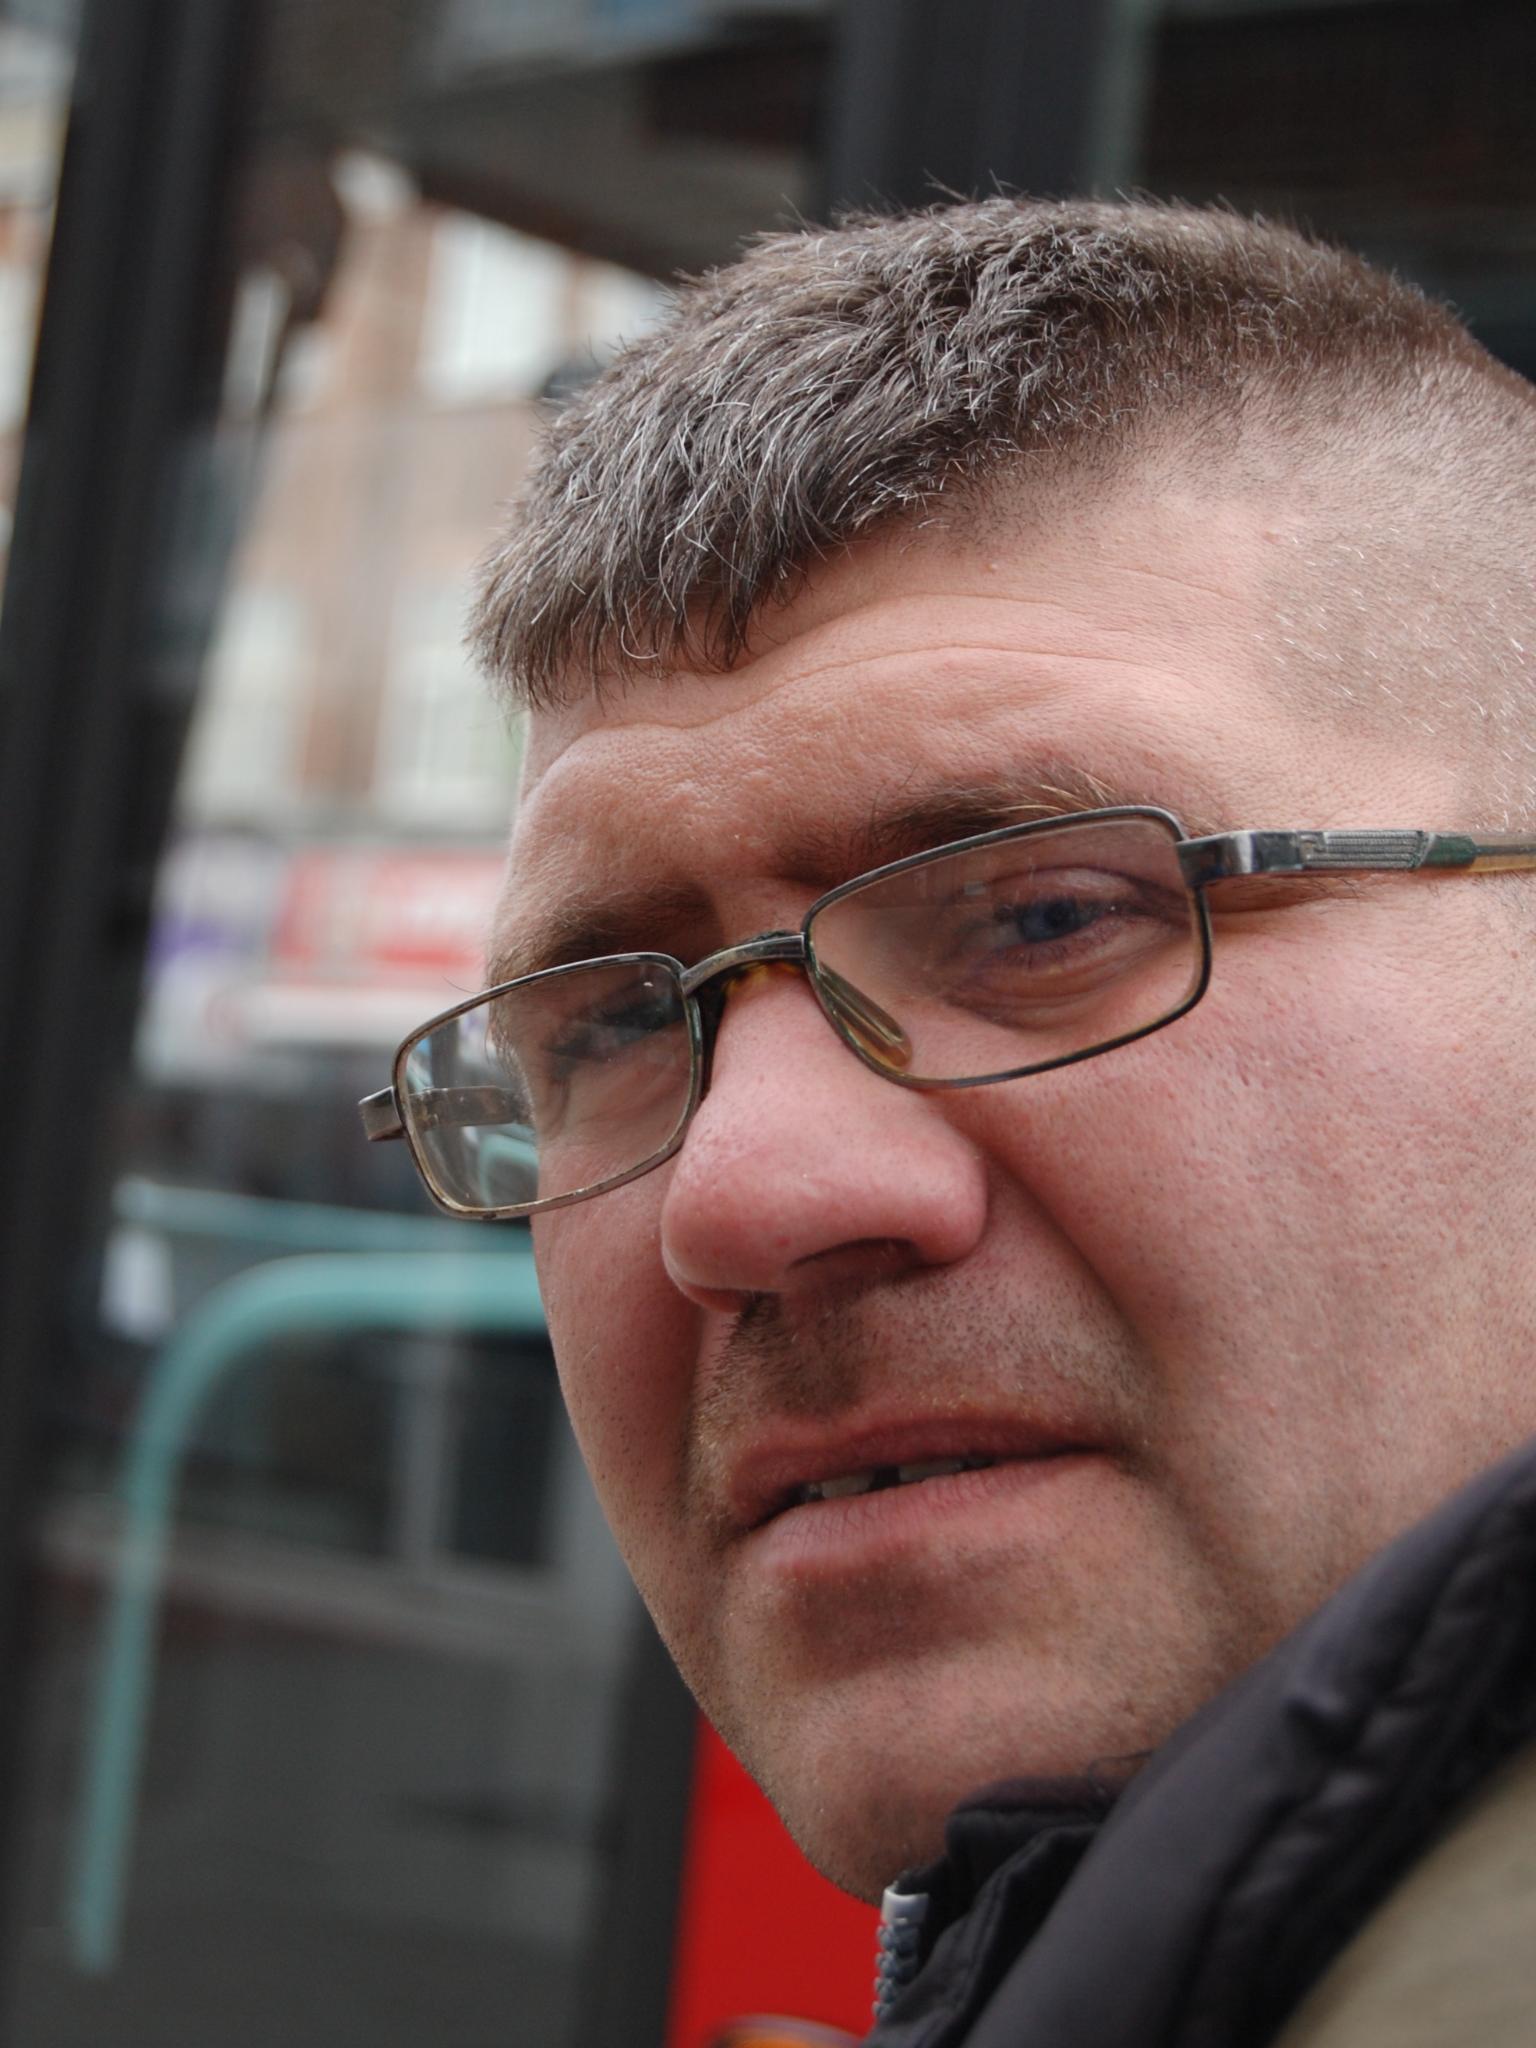 glasses-face-head-chin-forehead-human-ph